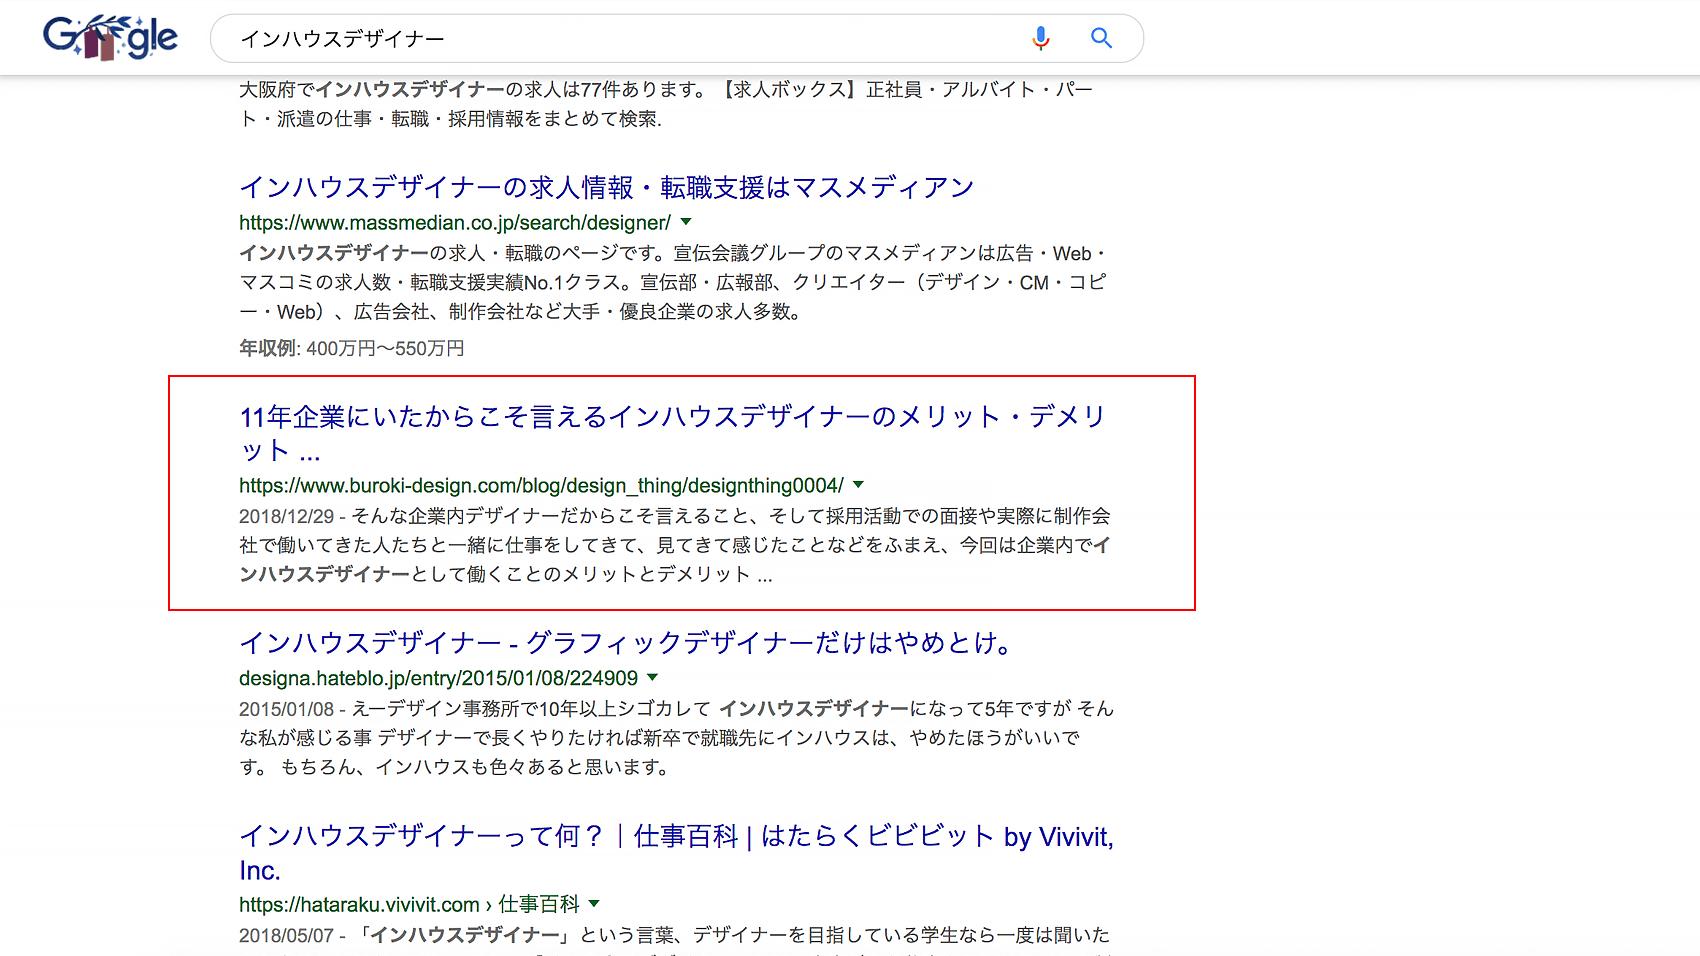 googleでの検索結果1ページ目